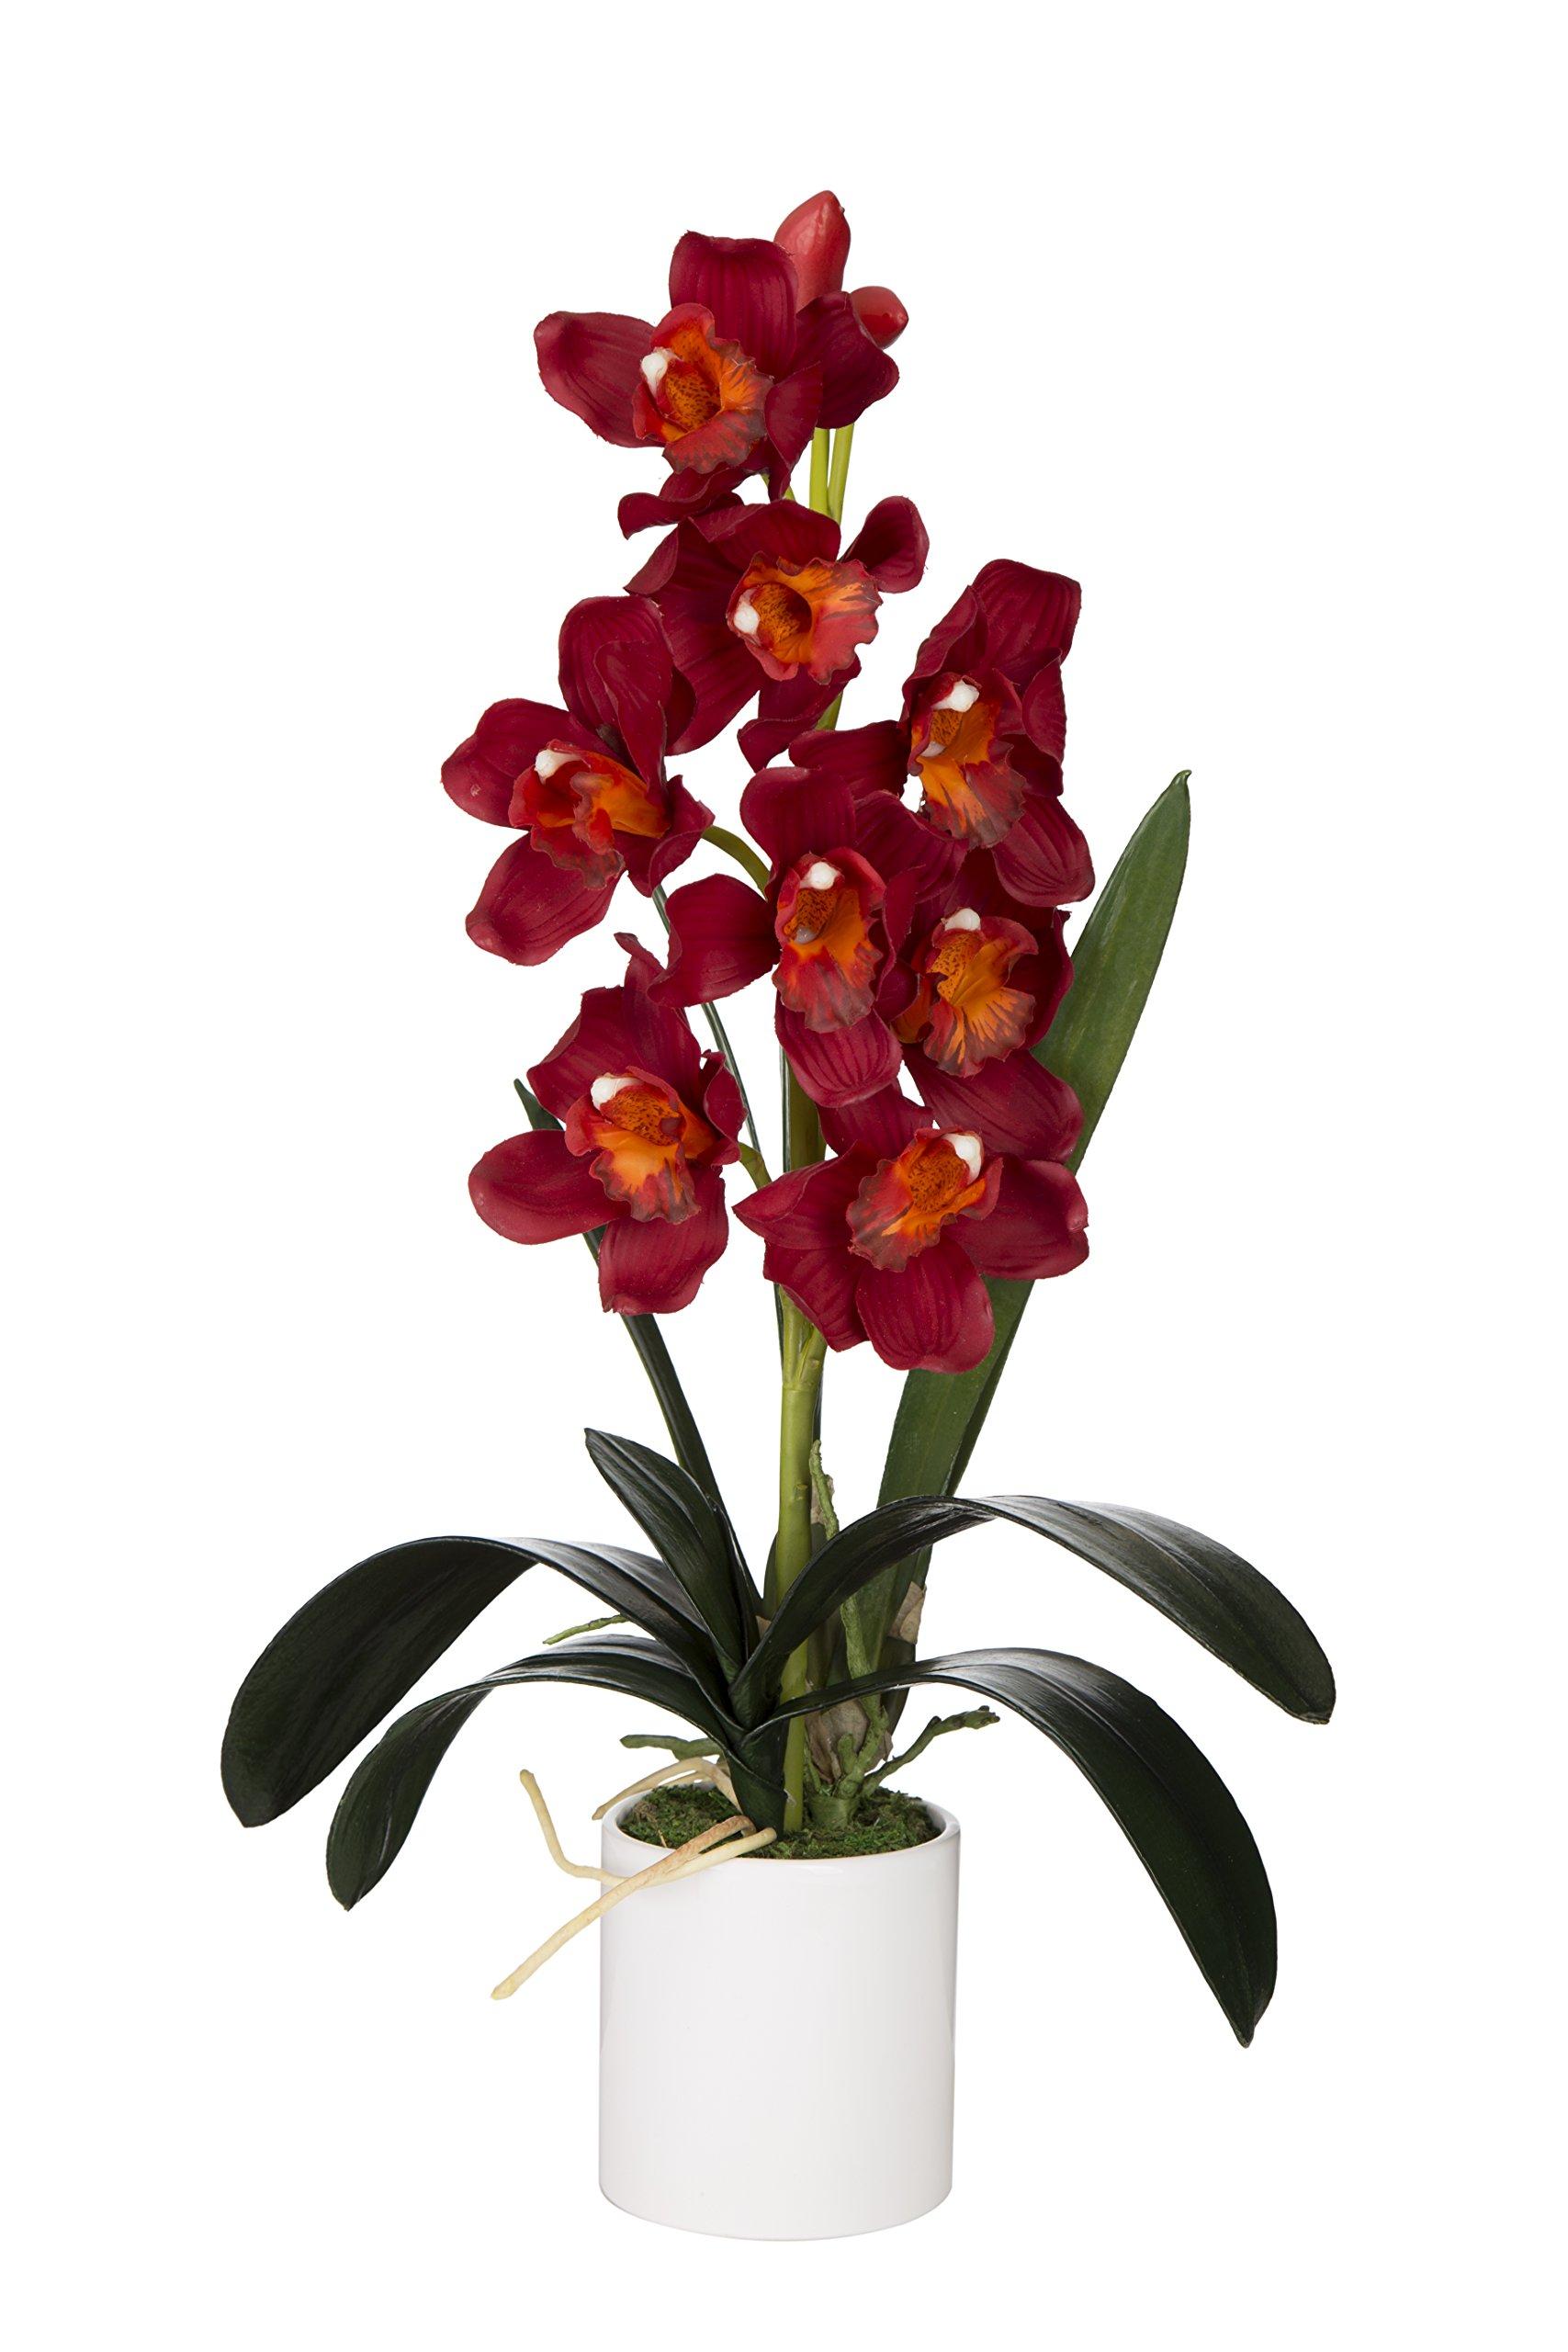 SilkenBloom Artificial Red - Rust Silk Cymbidium Stem Orchid in White Ceramic Pot